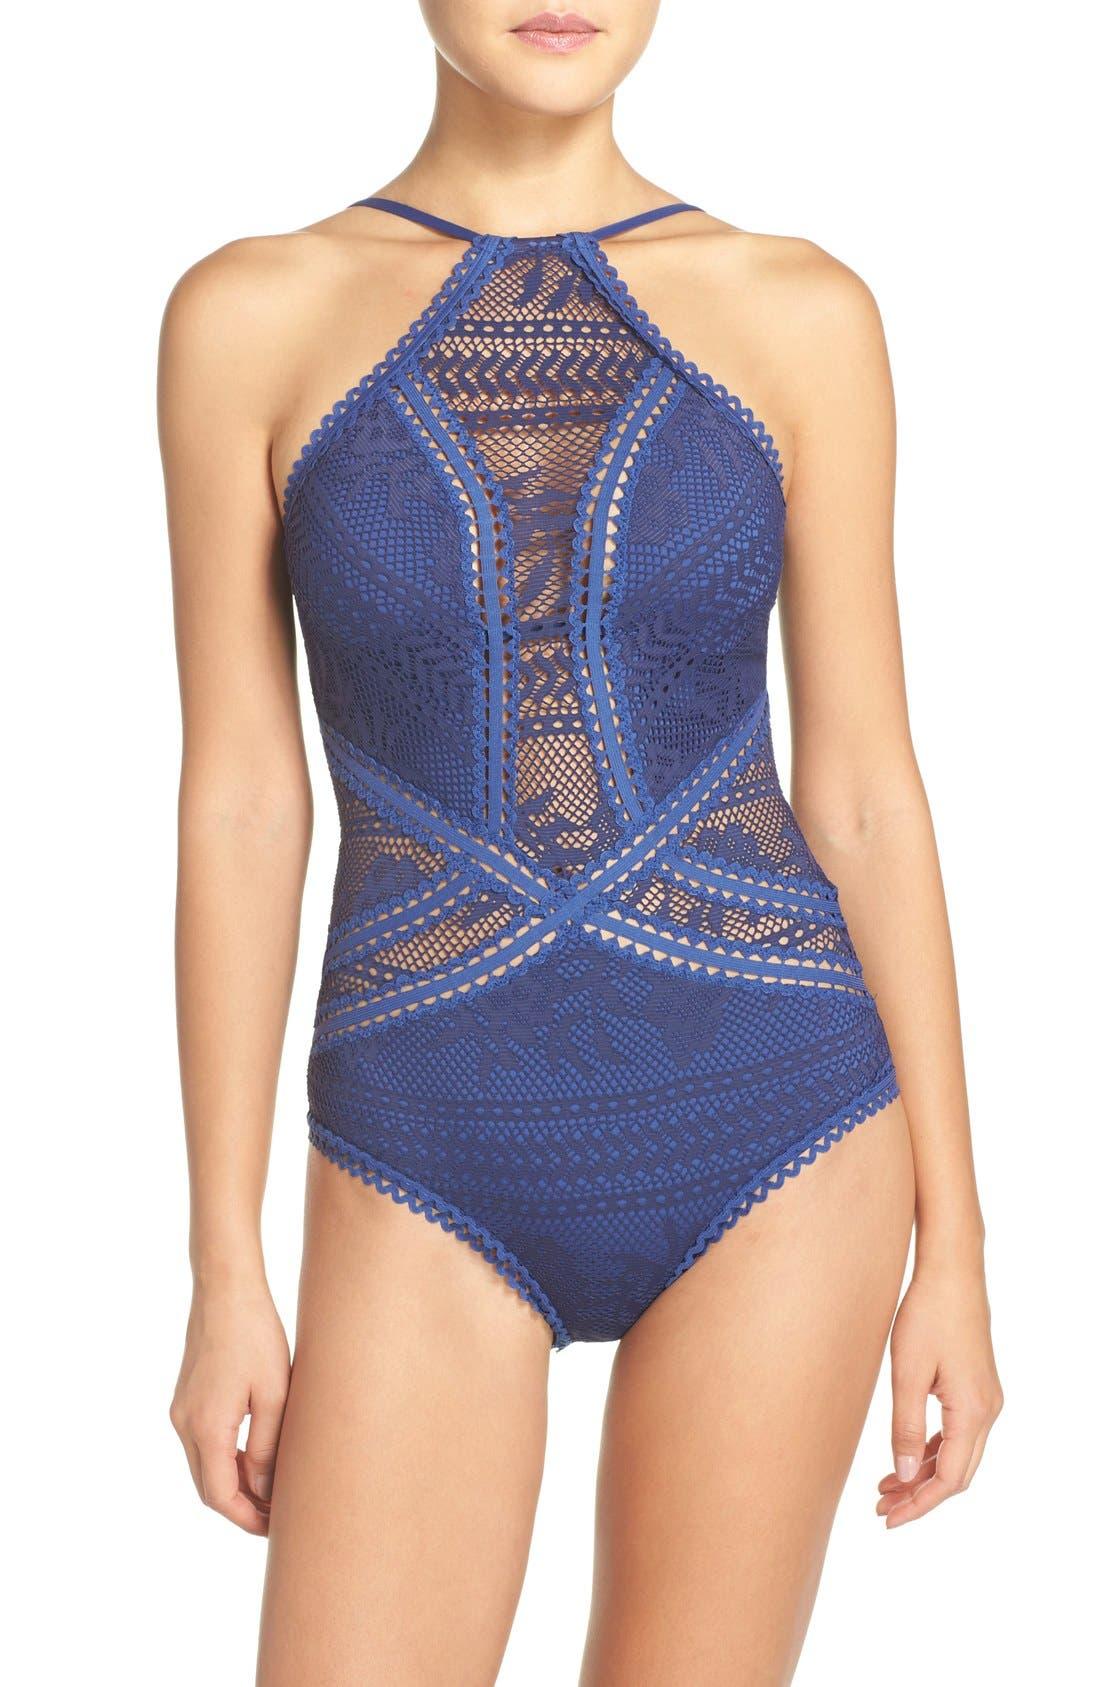 Prairie Rose Crochet One-Piece Swimsuit,                             Main thumbnail 3, color,